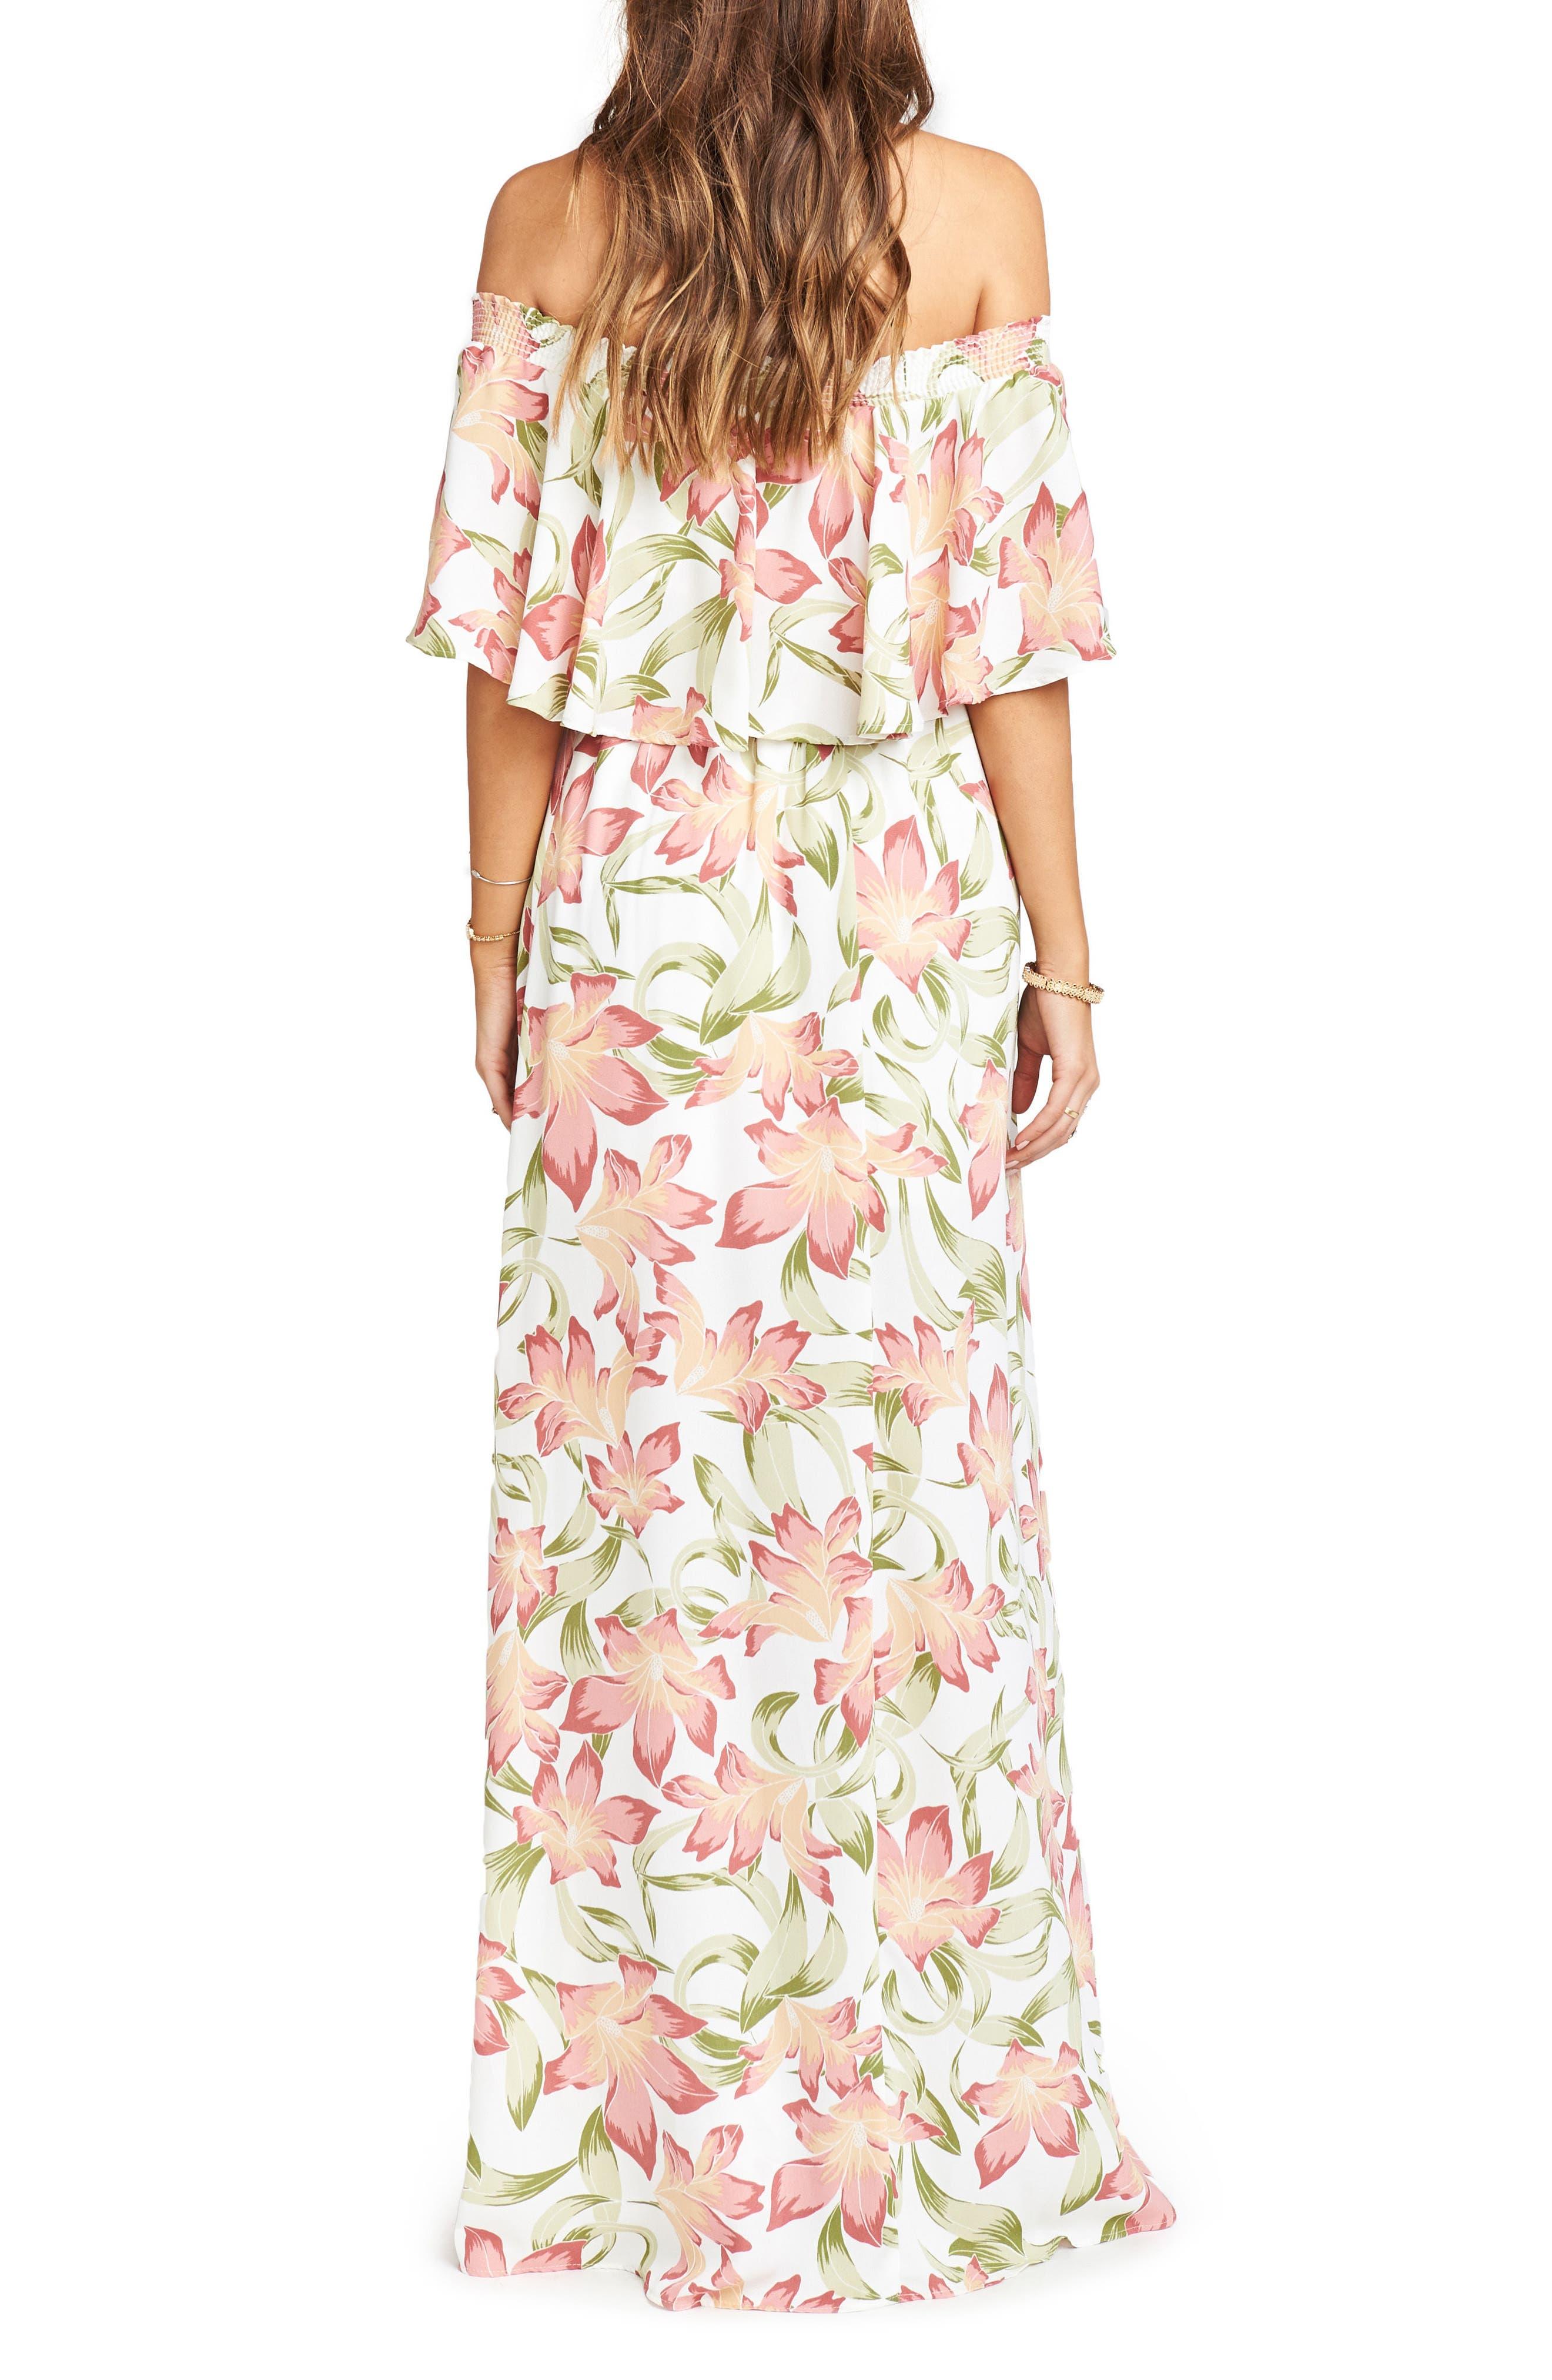 Hacienda Maxi Dress,                             Alternate thumbnail 2, color,                             Lily Lady Crepe